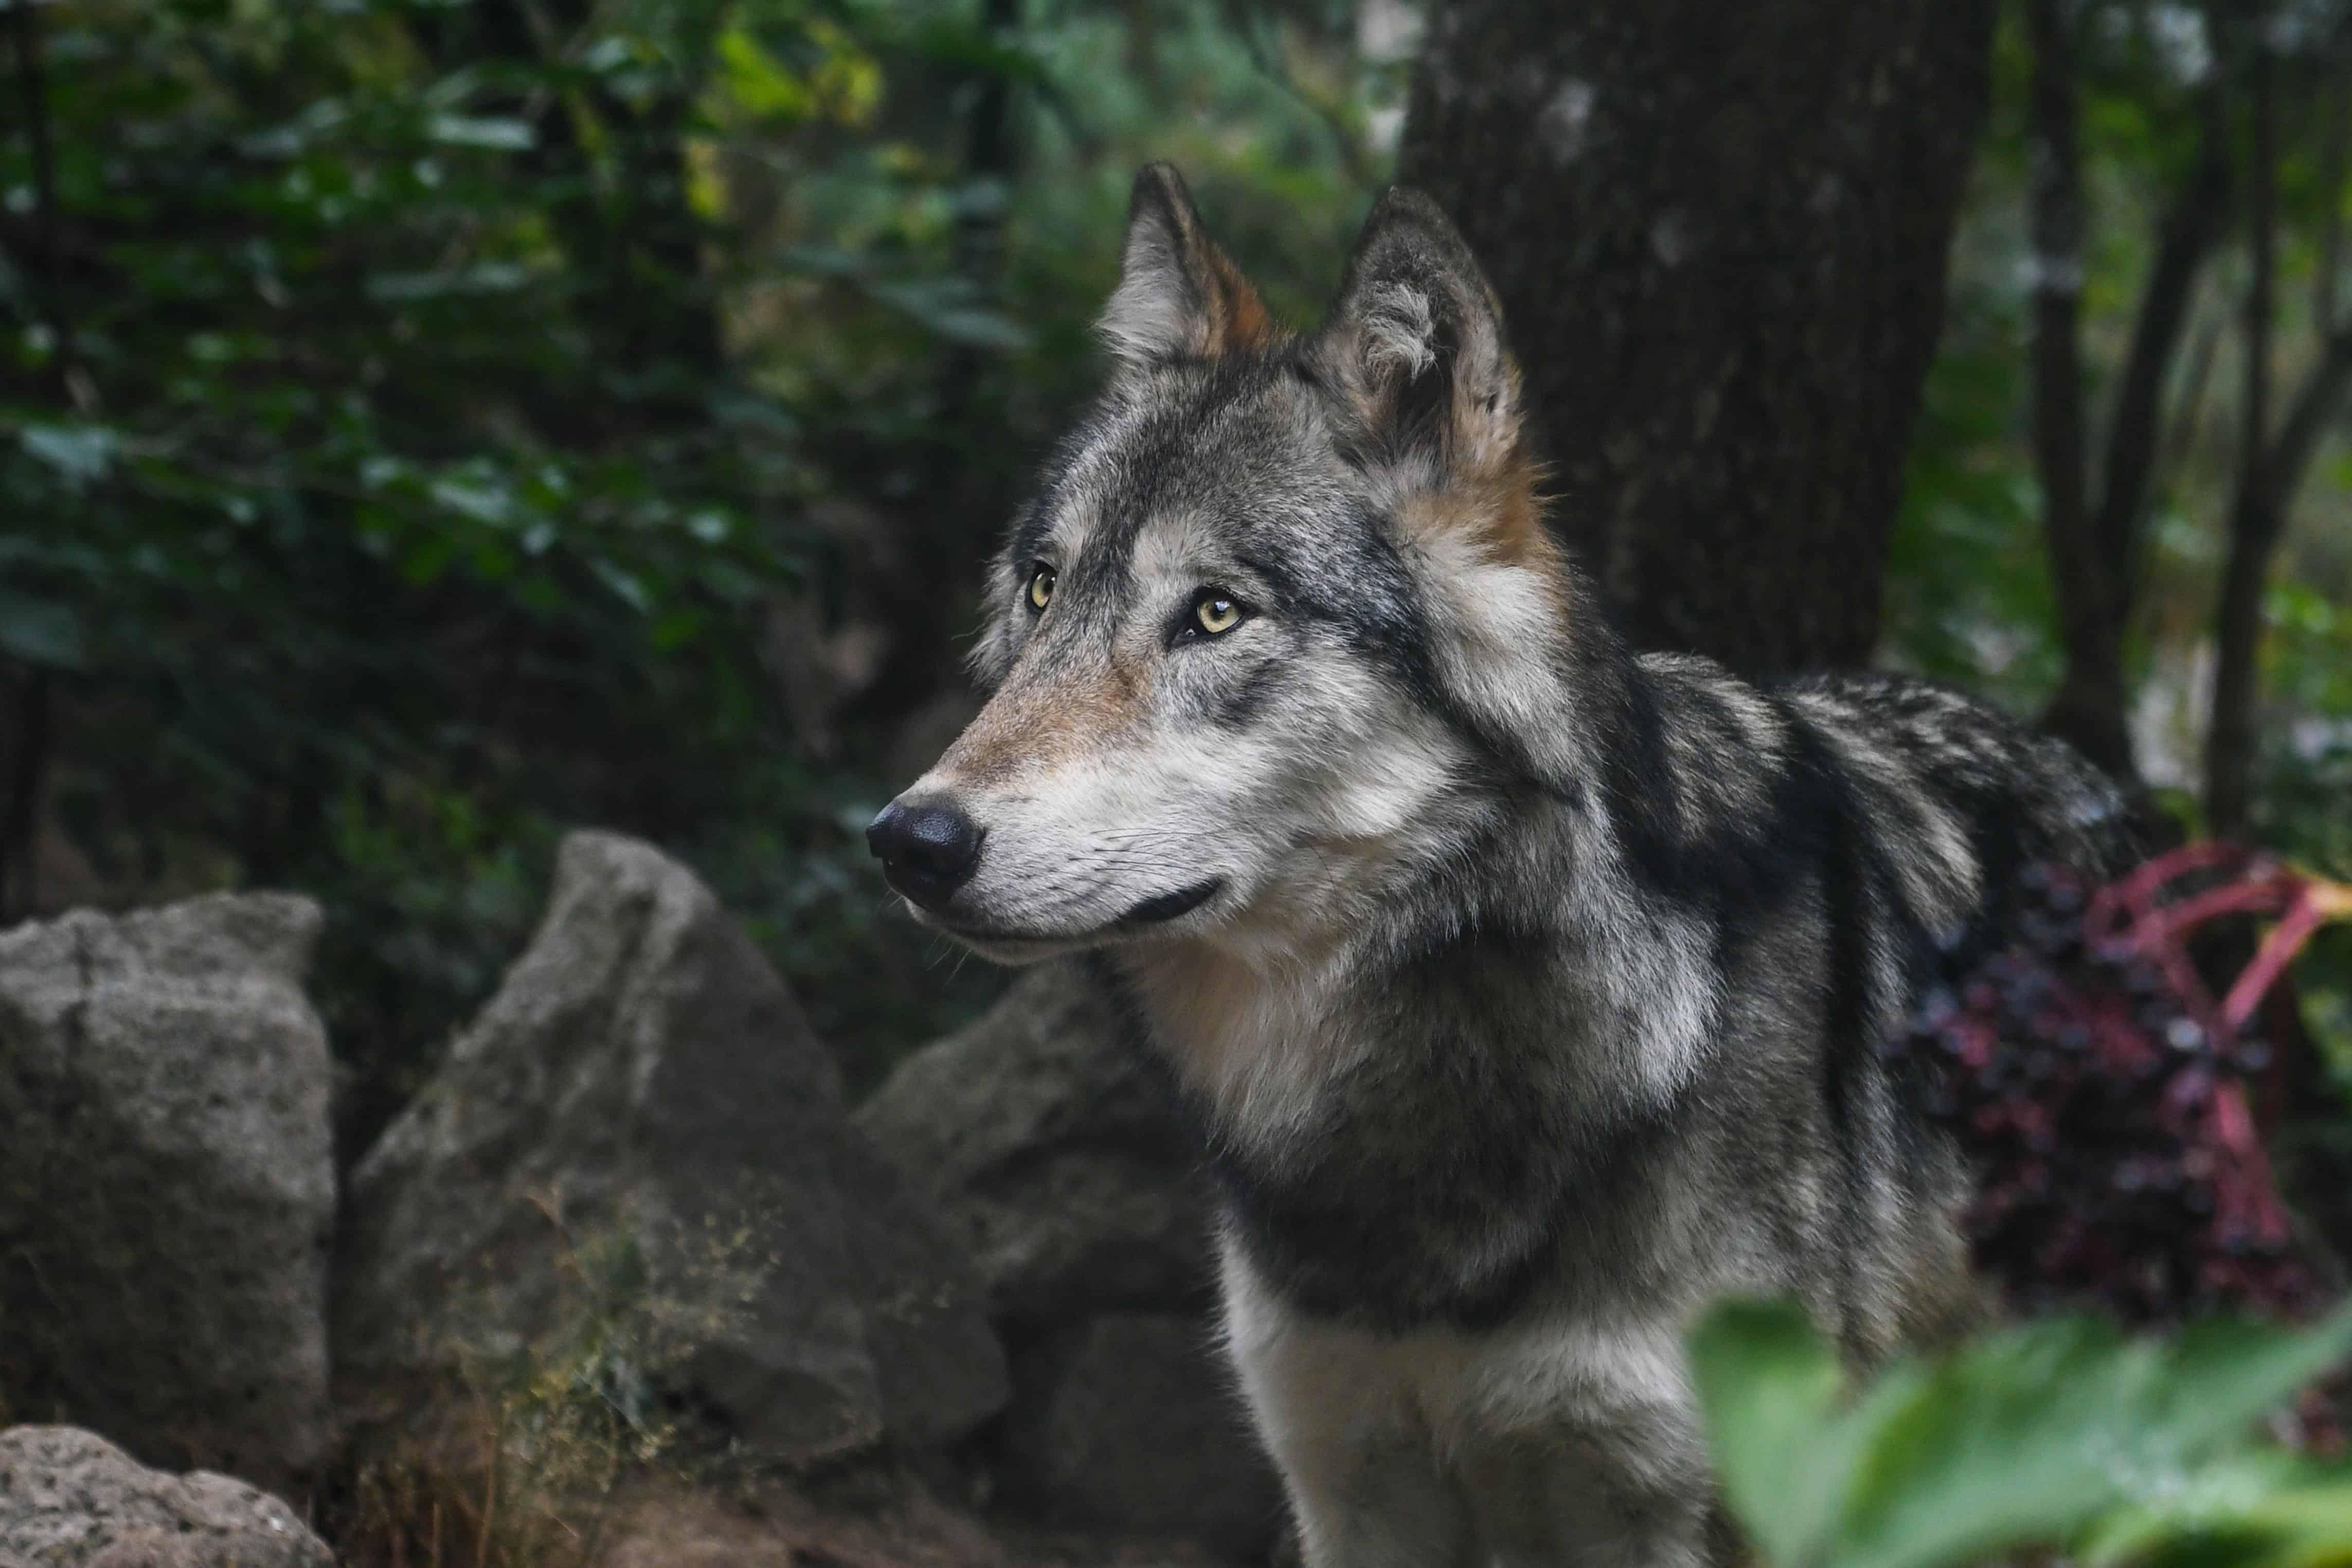 Animal Face Wallpaper Image Libre Predator Loup De La For 234 T Nature Animal